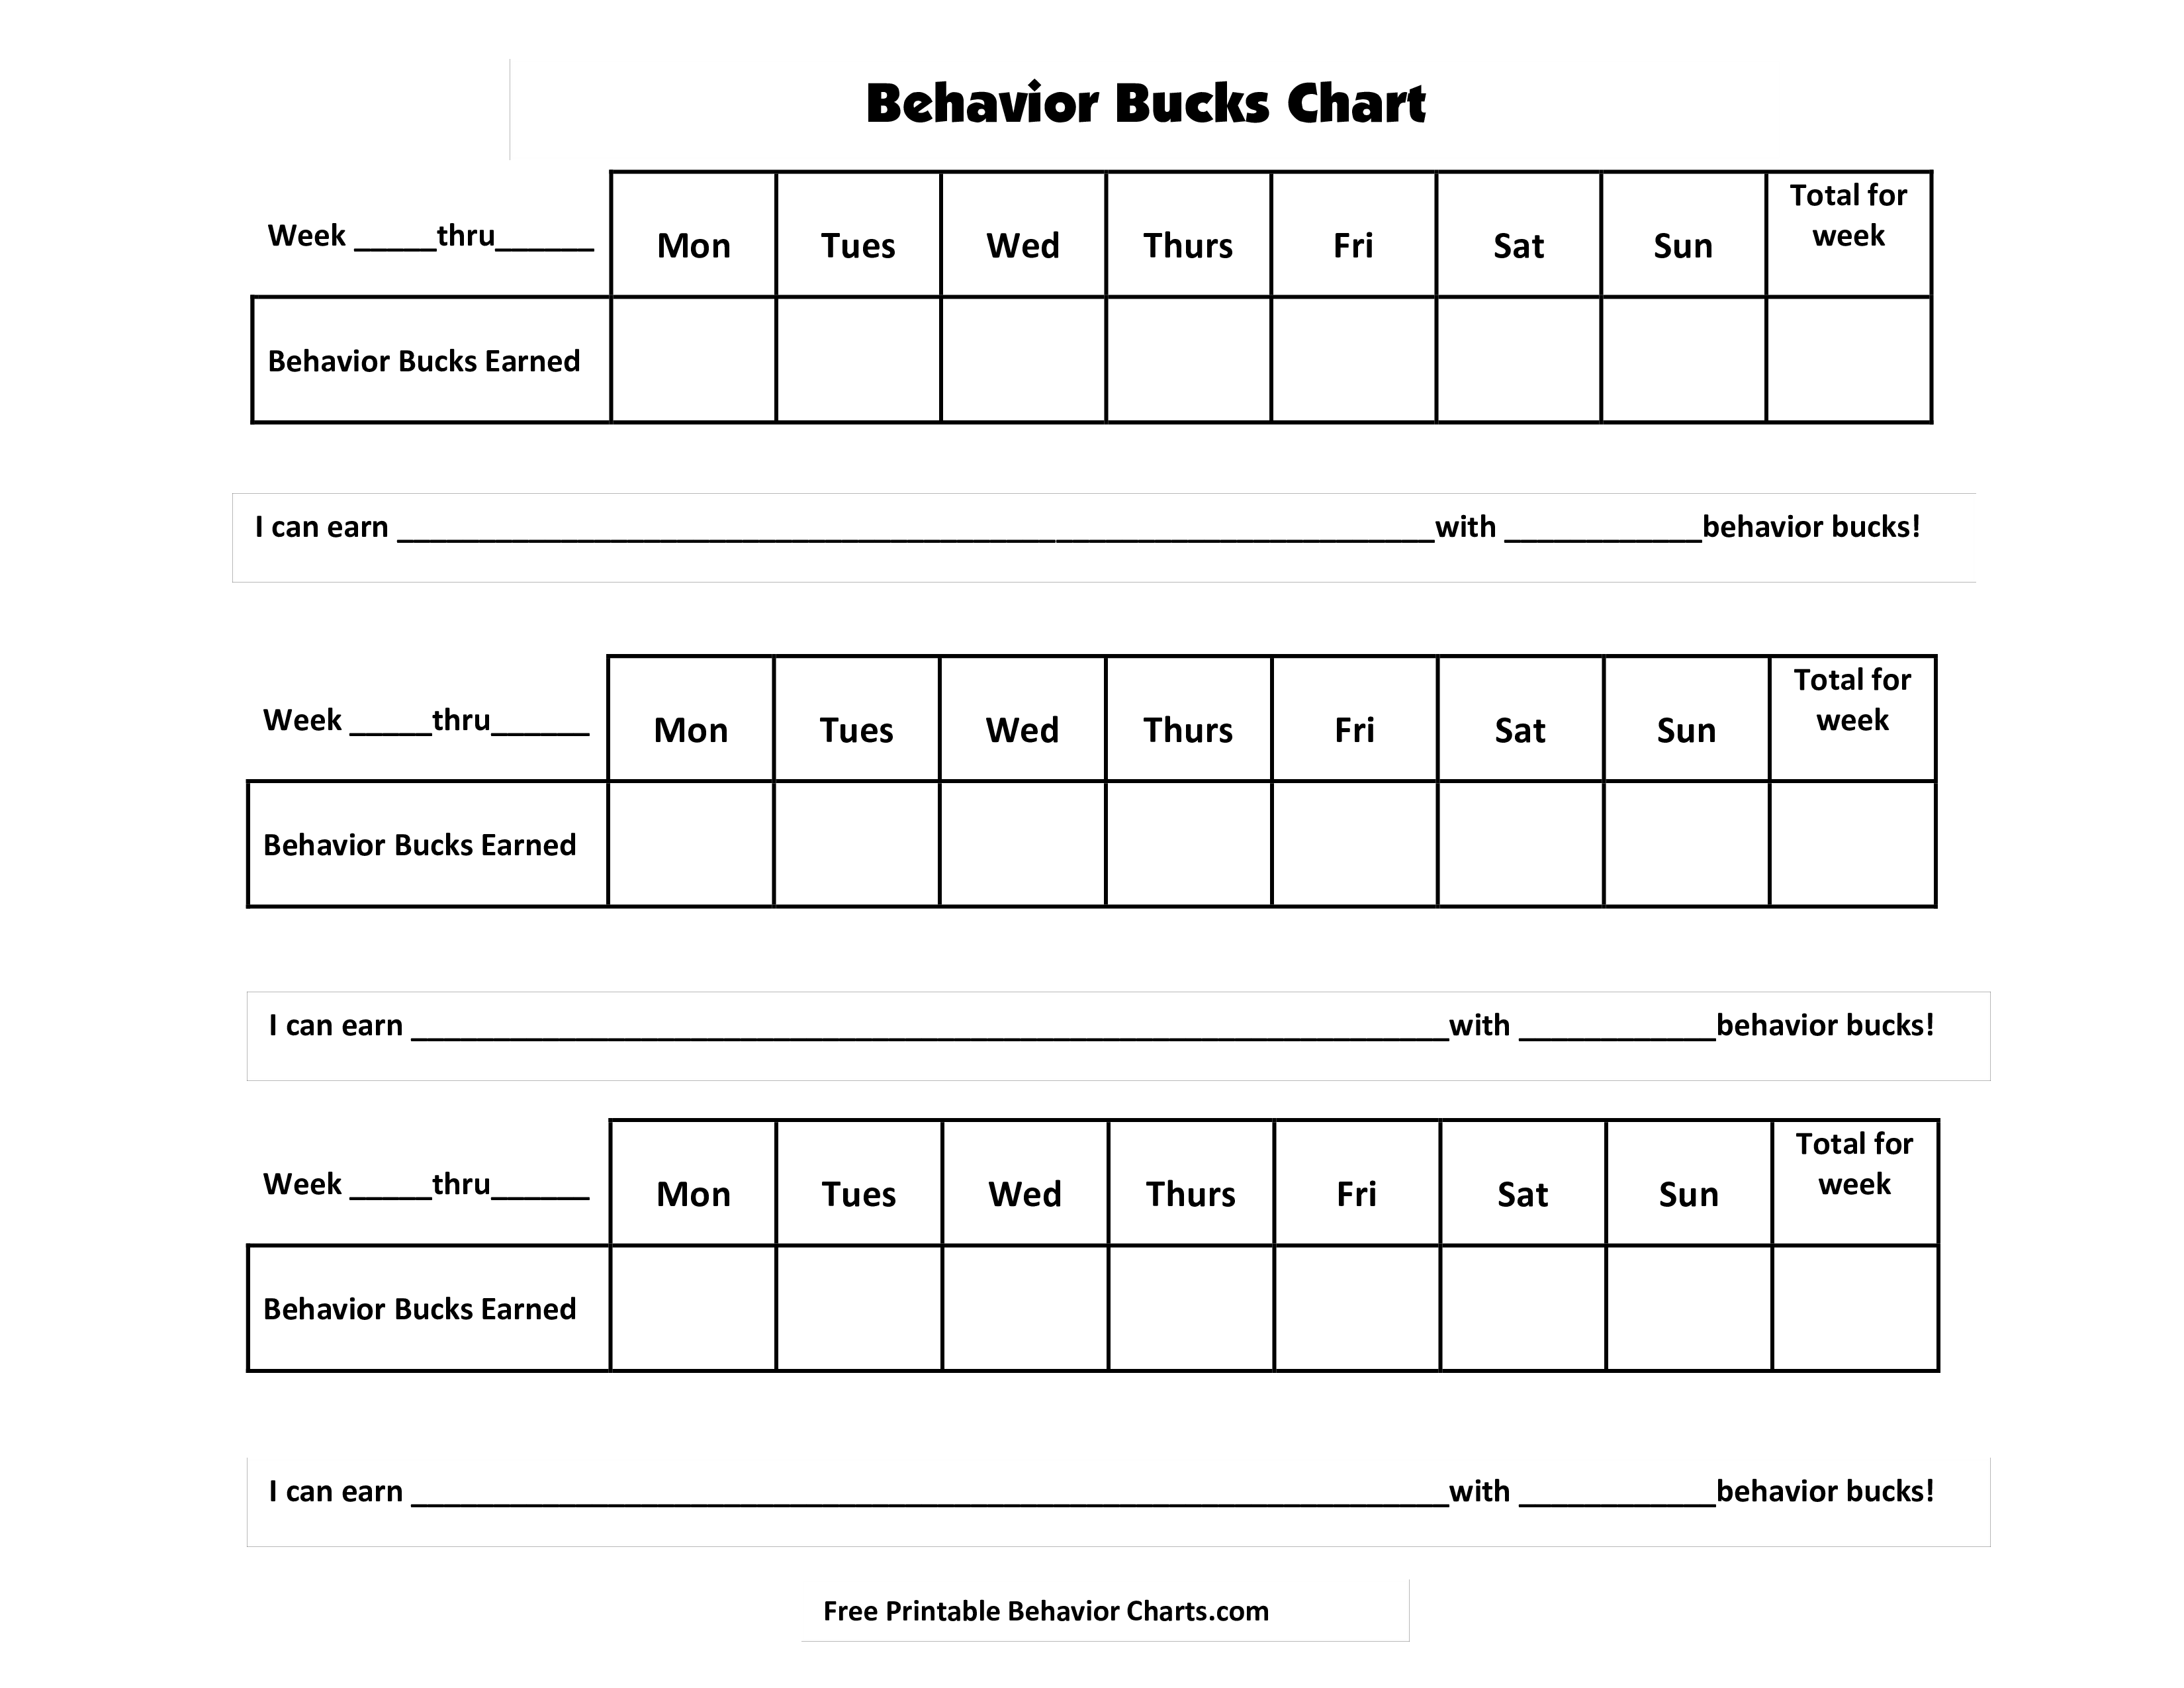 classroom bucks template - free behavior bucks templates at